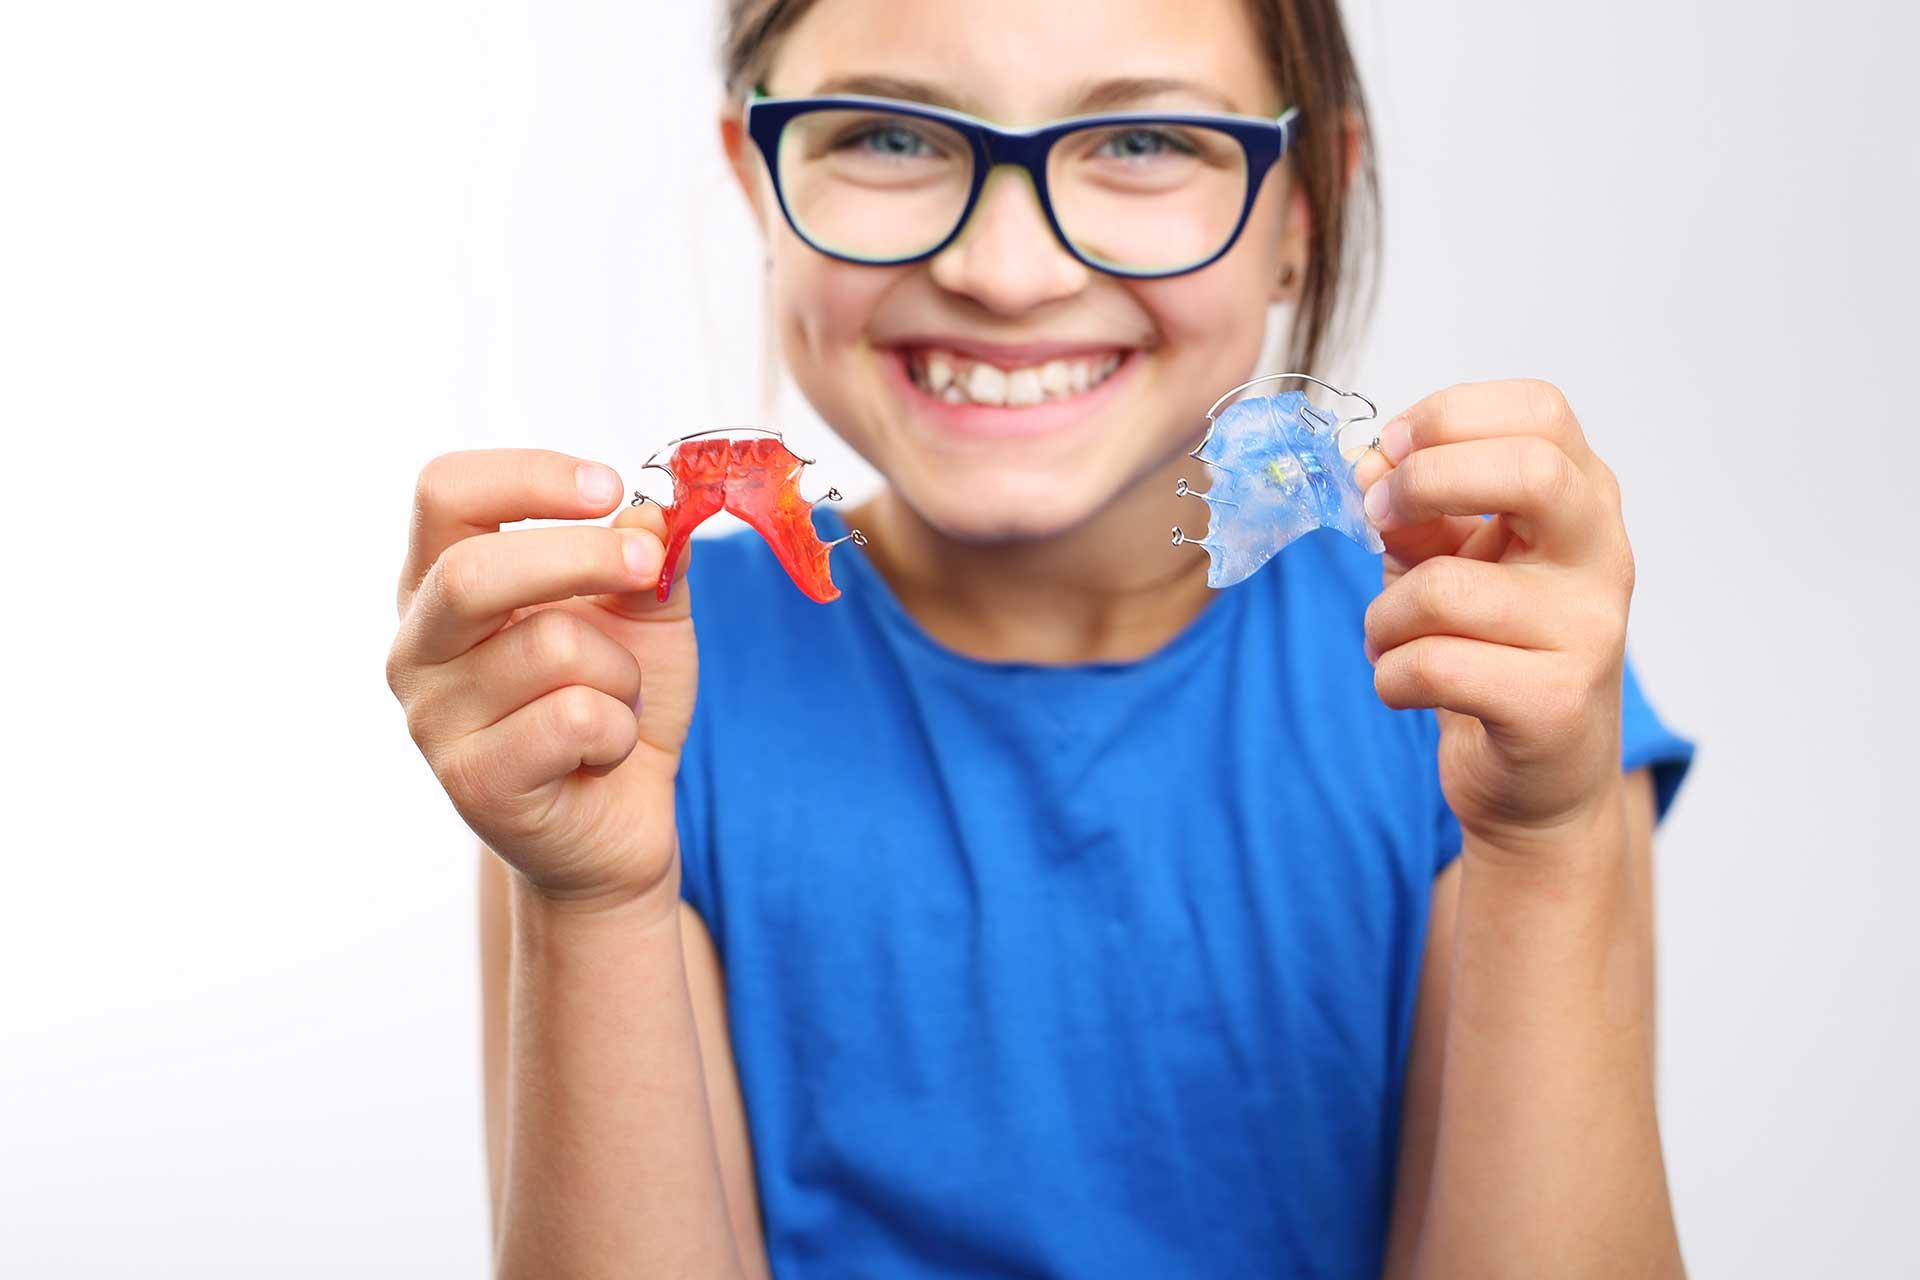 Diplomado en Ortodoncia Interceptiva